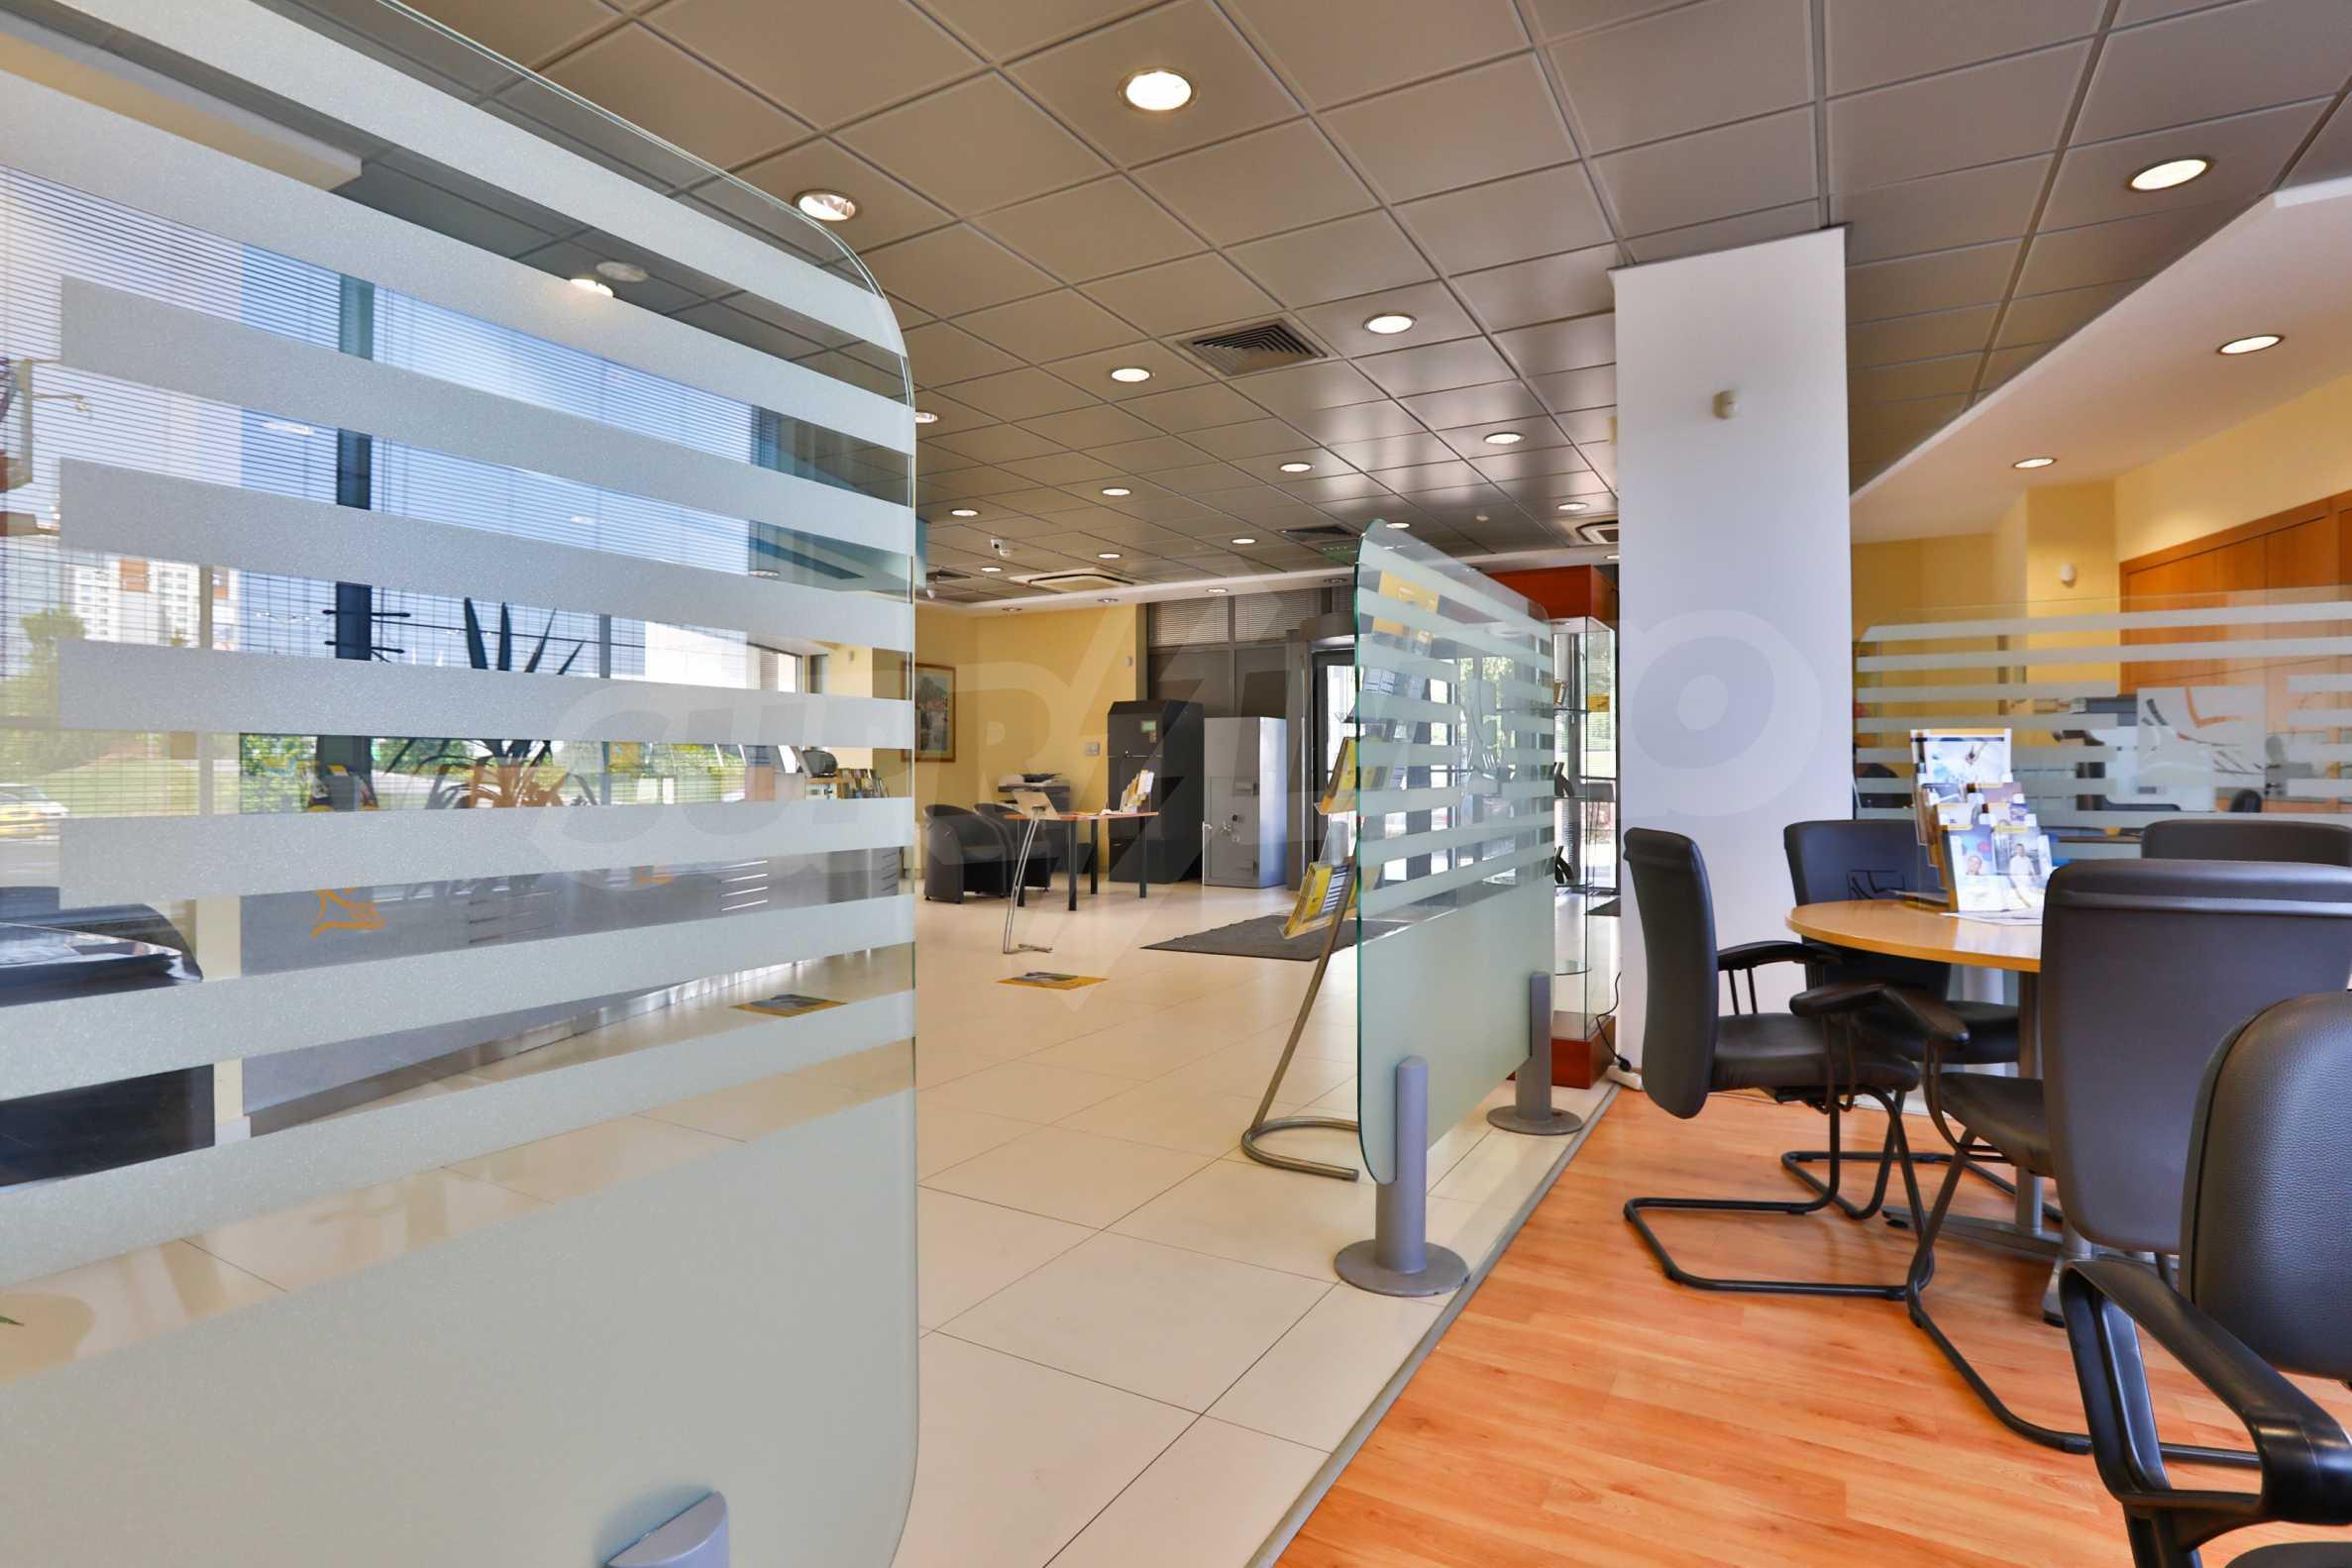 Офис в бизнес сграда висок клас на бул. Цариградско шосе 2